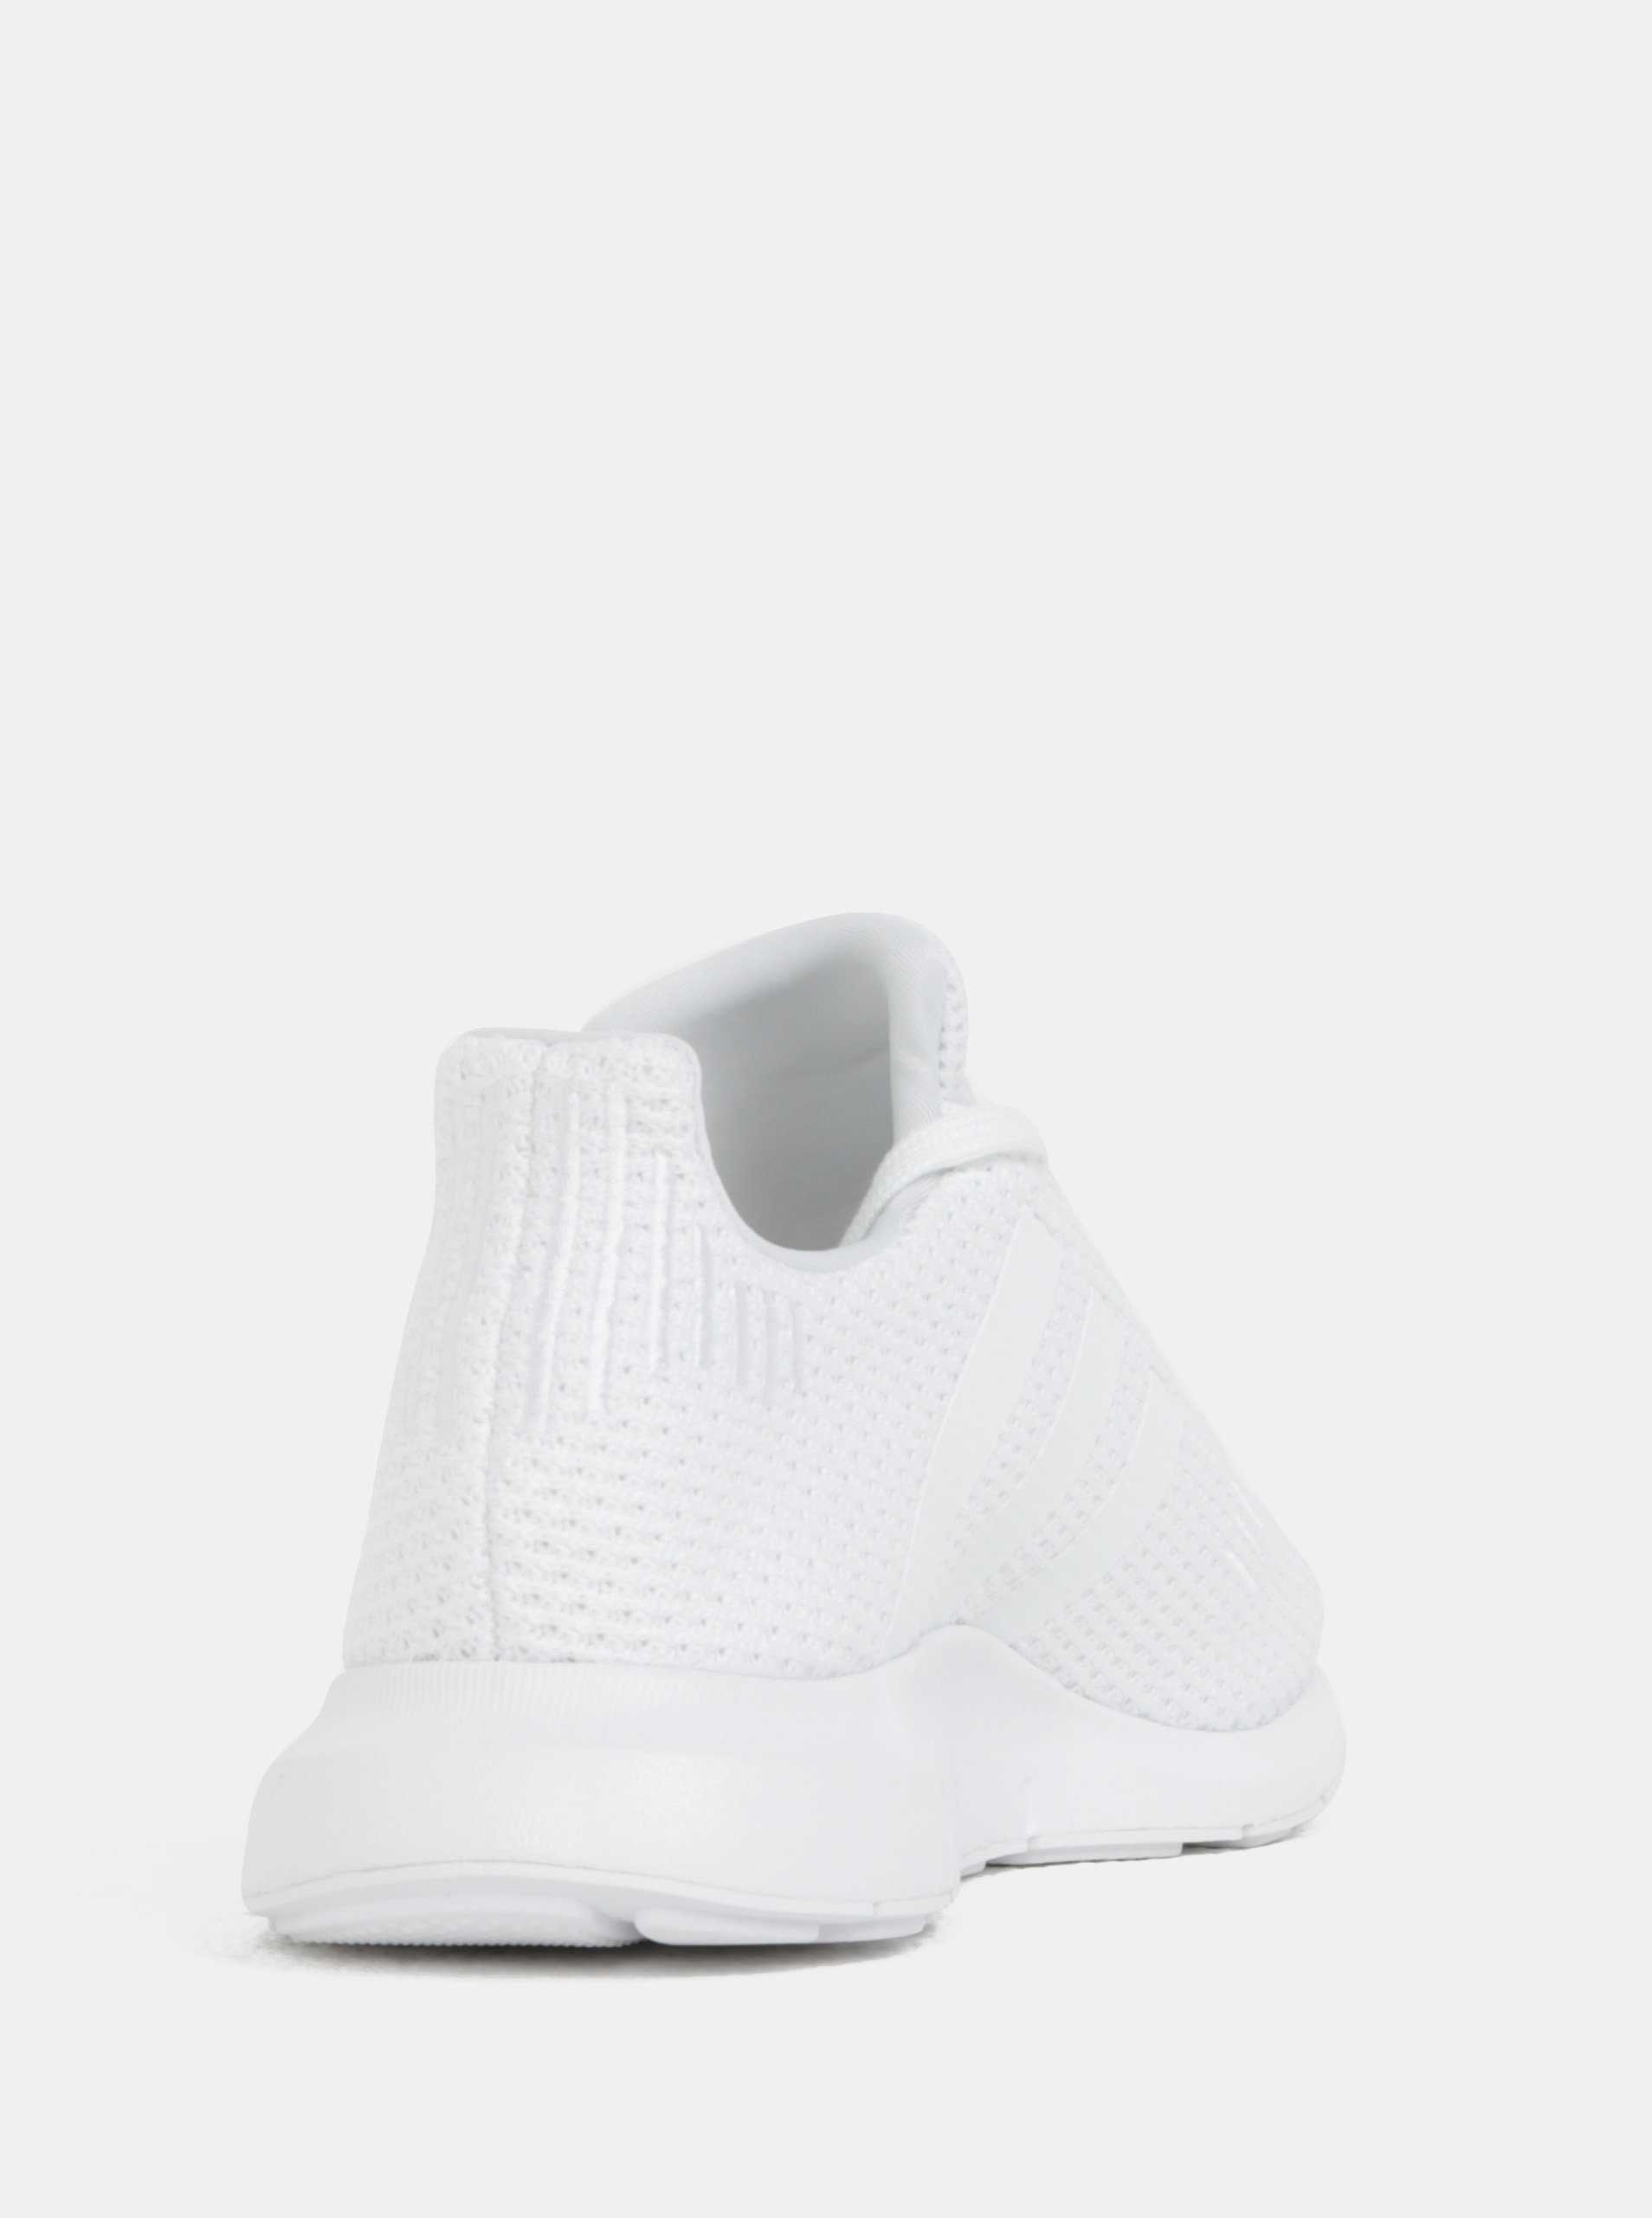 Biele dámske tenisky adidas Originals Swift ... a6d94115ff6